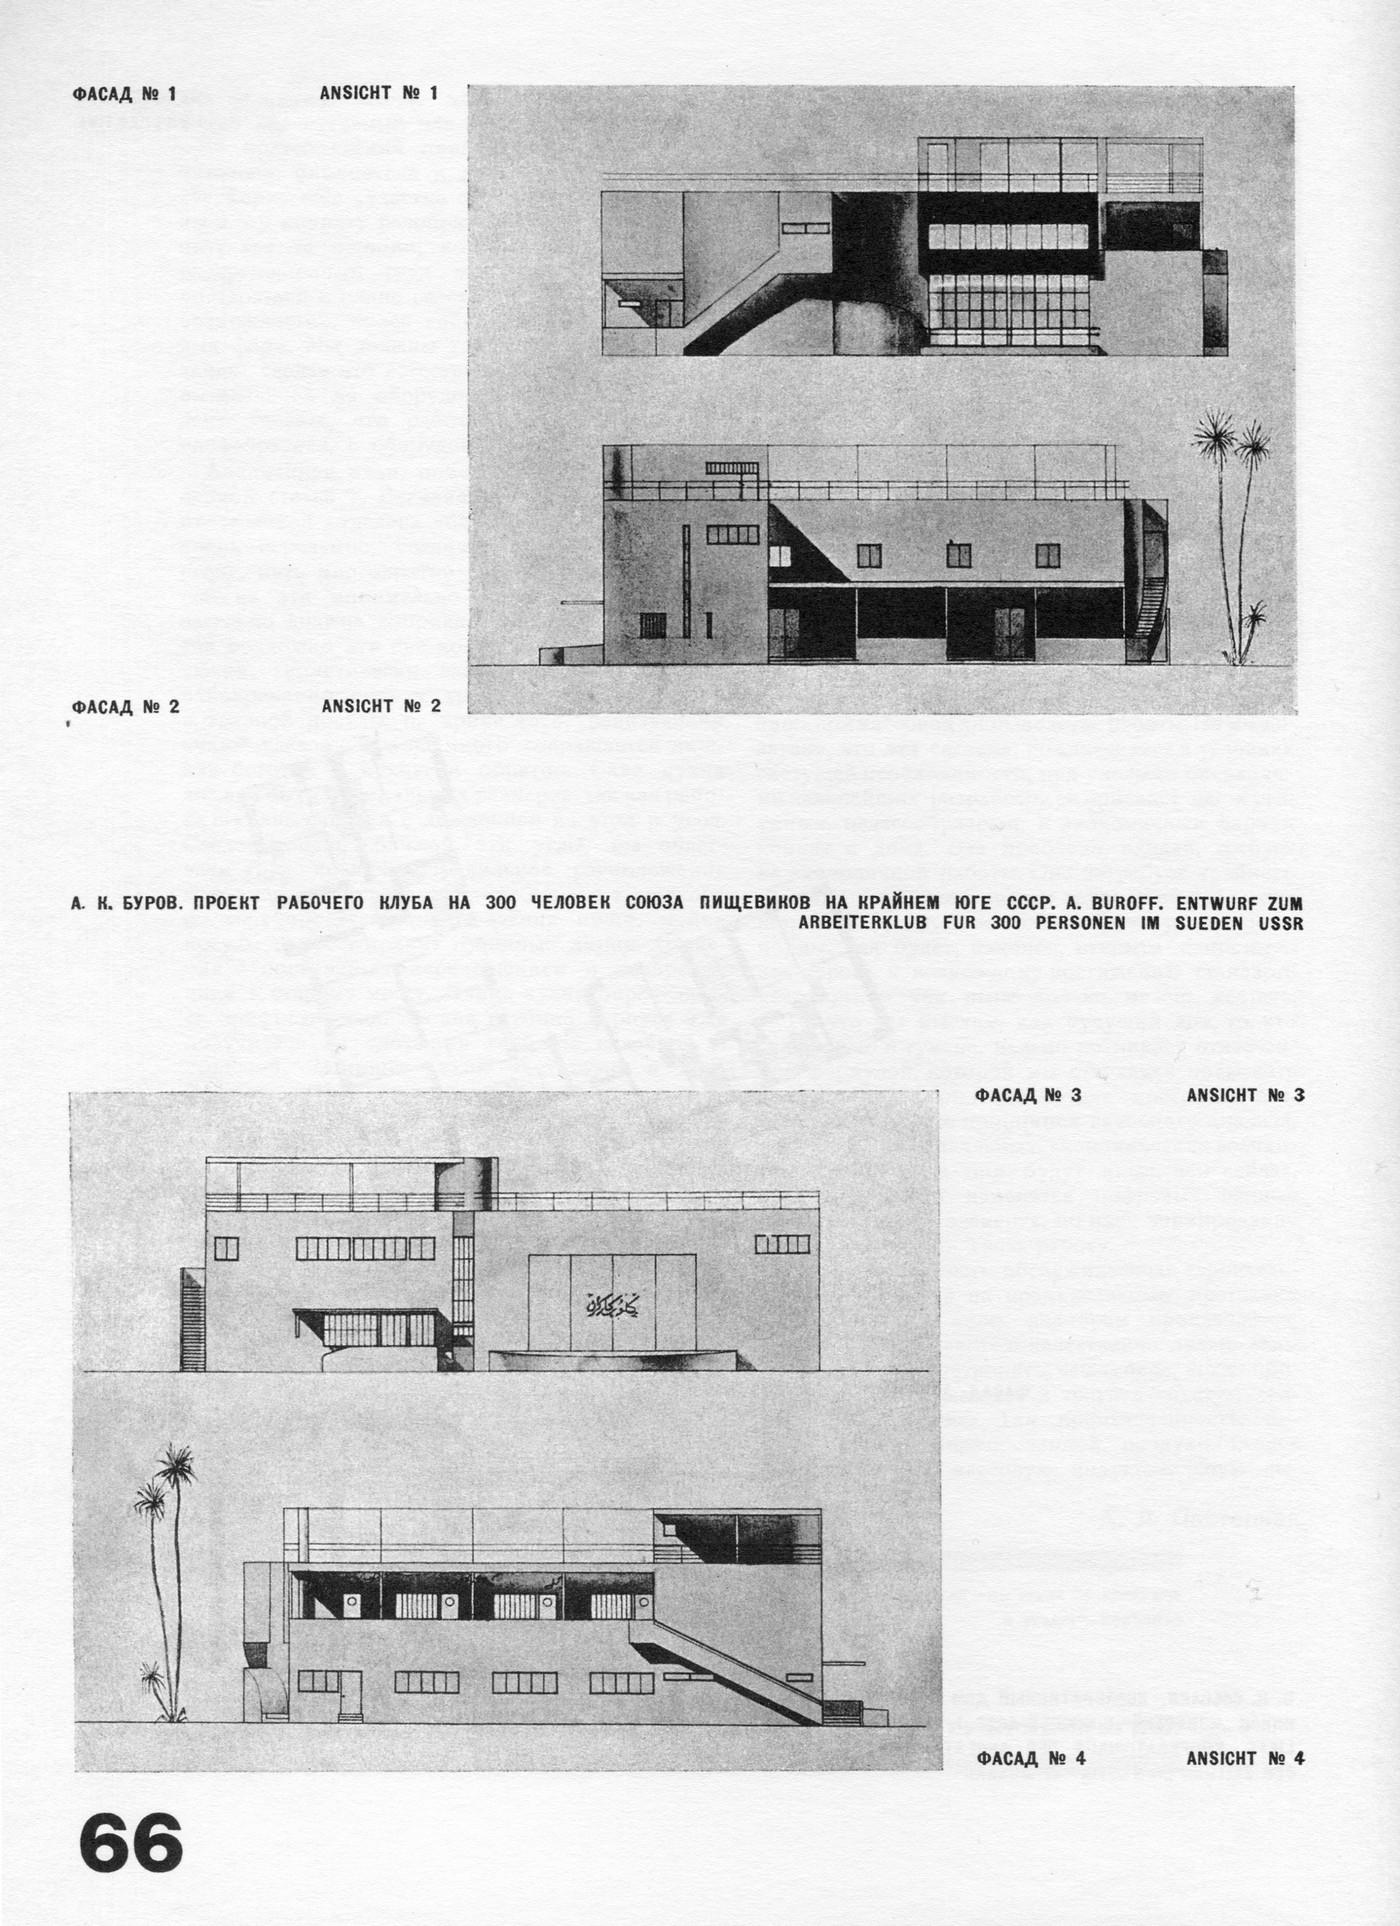 tehne.com-sa-1927-2-1400-022